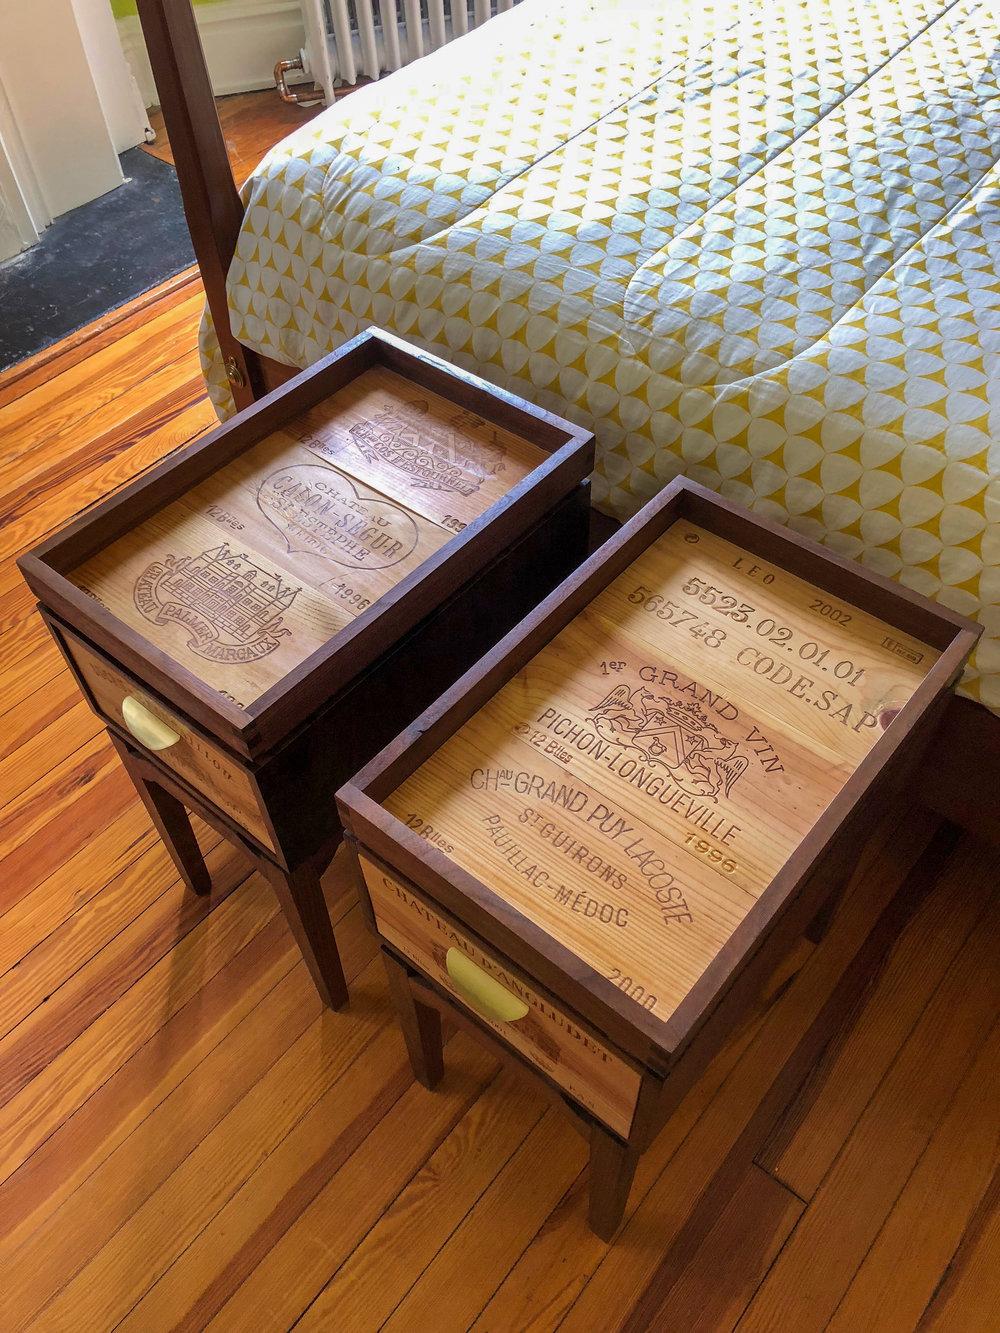 Custom Walnut Side Tables Reclaimed Wine Crate furniture Sallie Plumley Studio Richmond Virginia Sally Plumley Custom Woodworking and Furniture Design